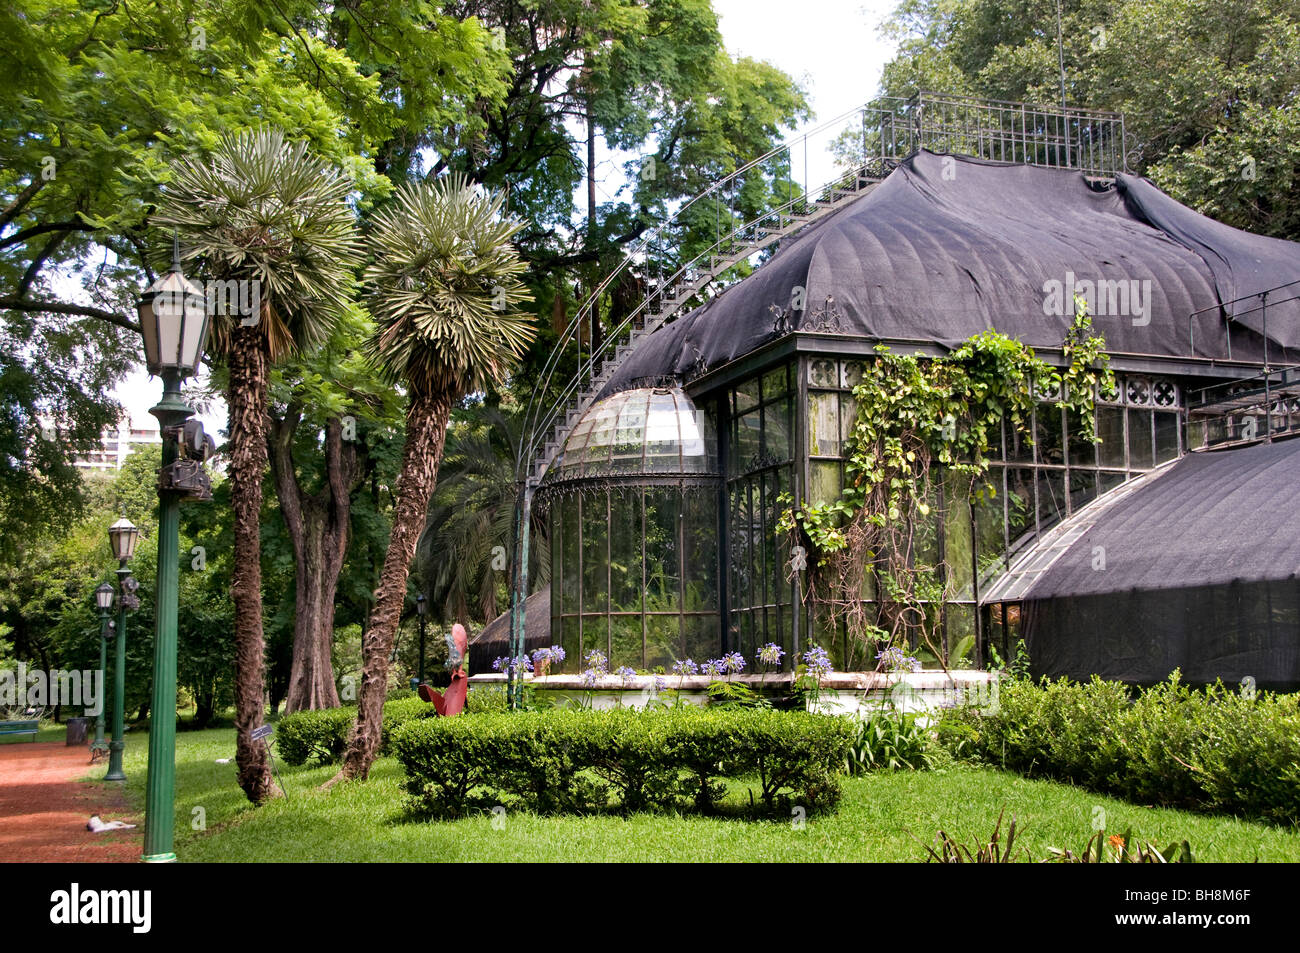 Buenos aires argentina jardin botanico botanical gardens for Botanico jardin